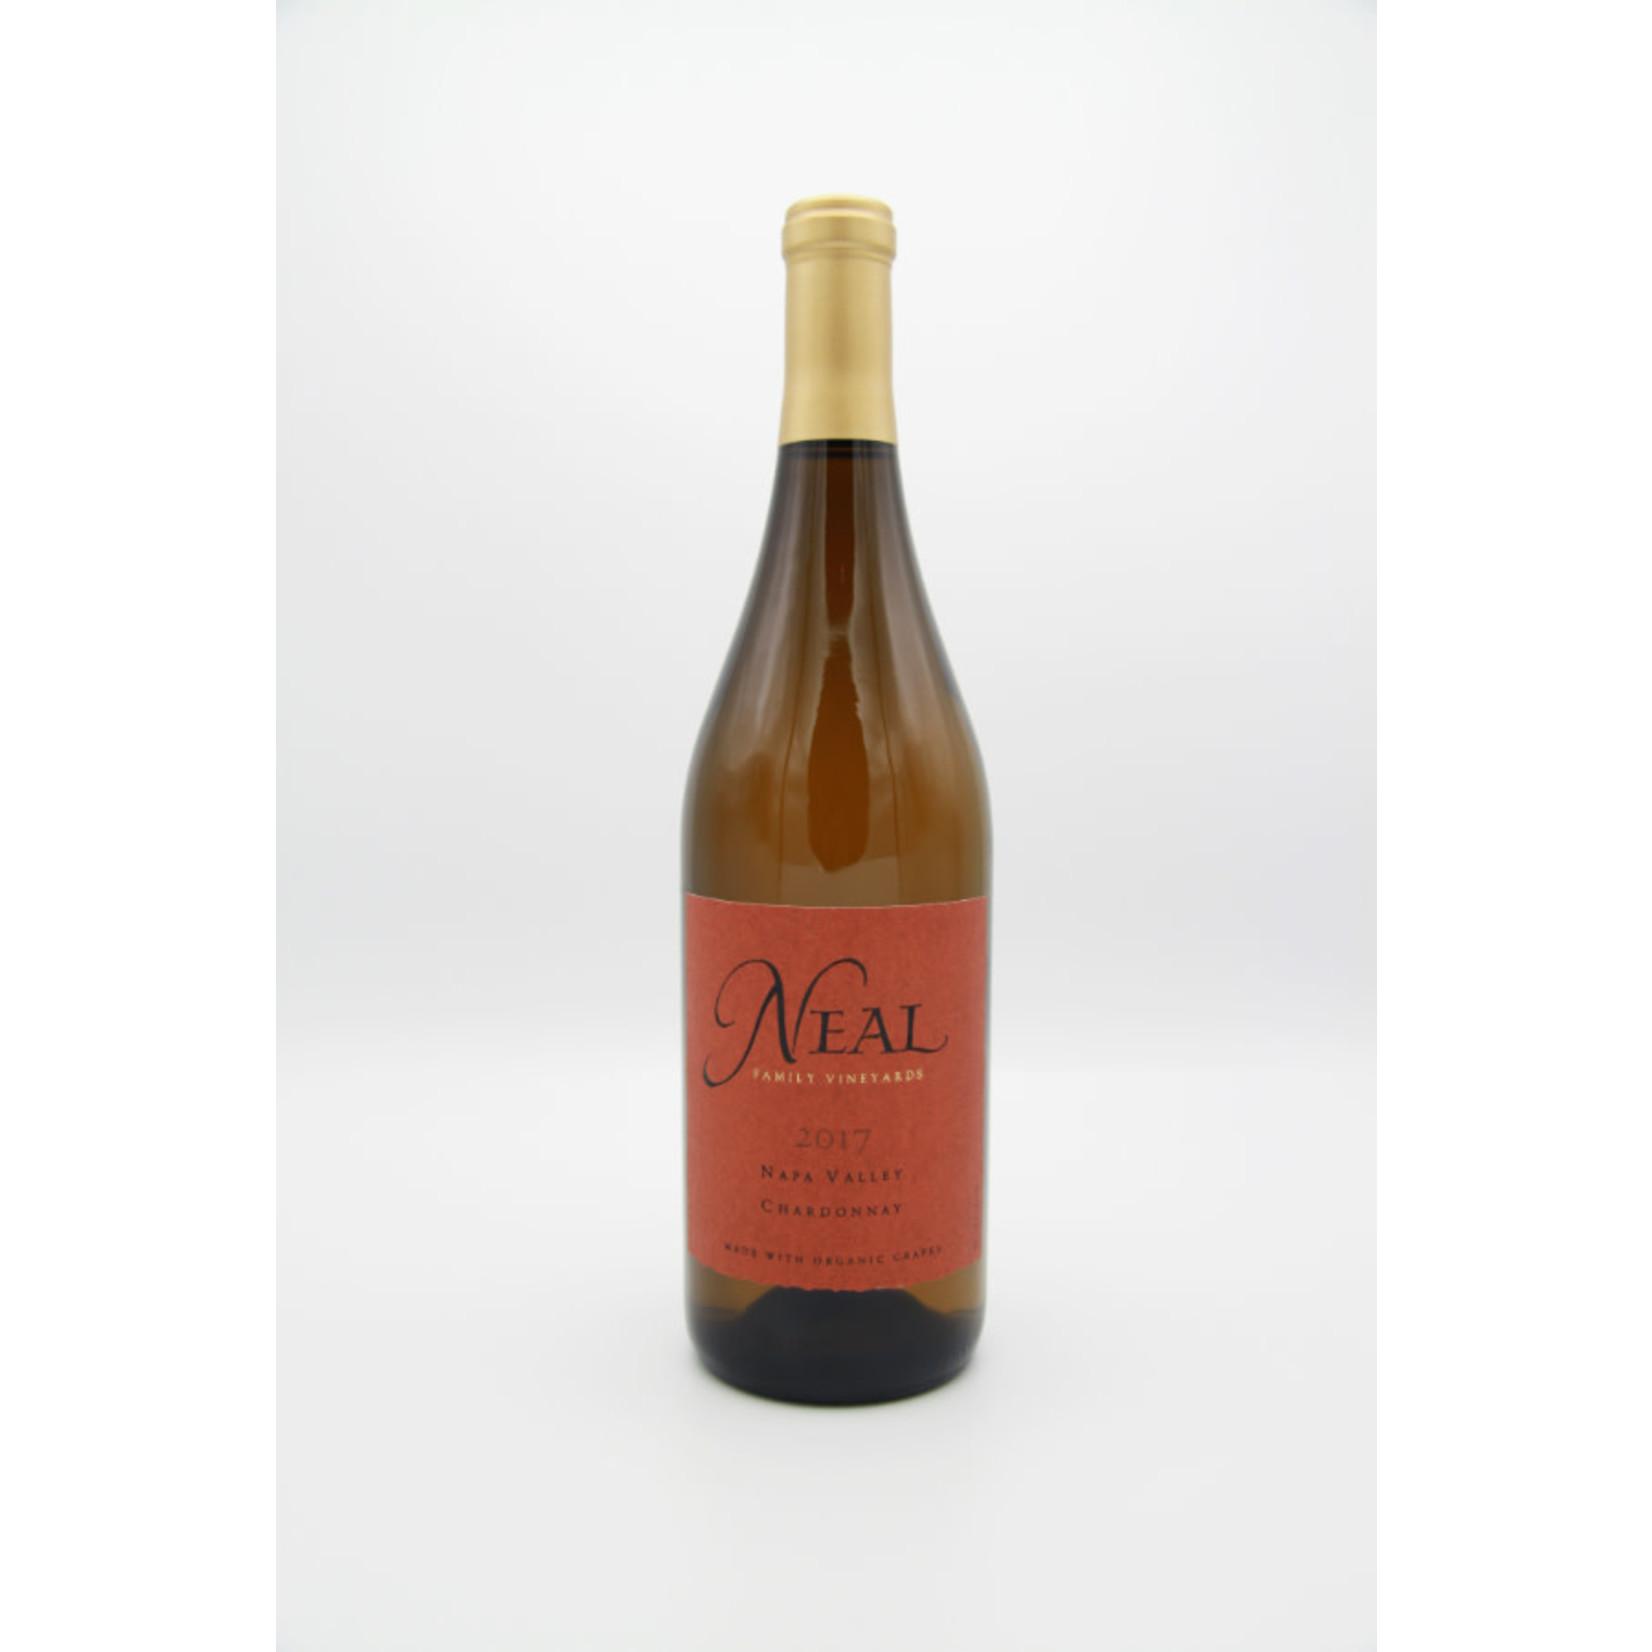 2017 Neal Family Vineyards Chardonnay